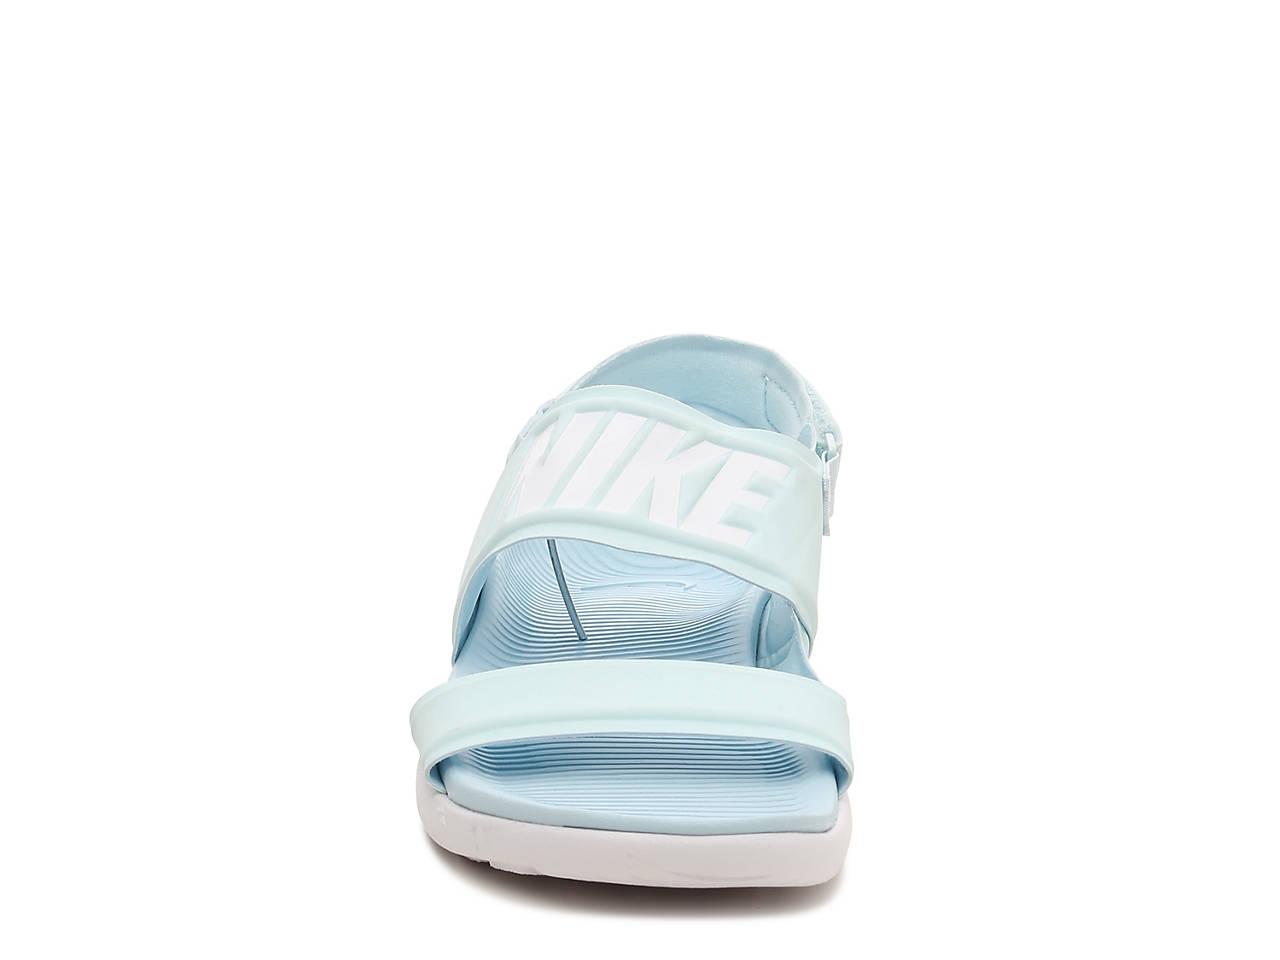 9f83c1aff15c Nike Tanjun Sport Sandal Women s Shoes